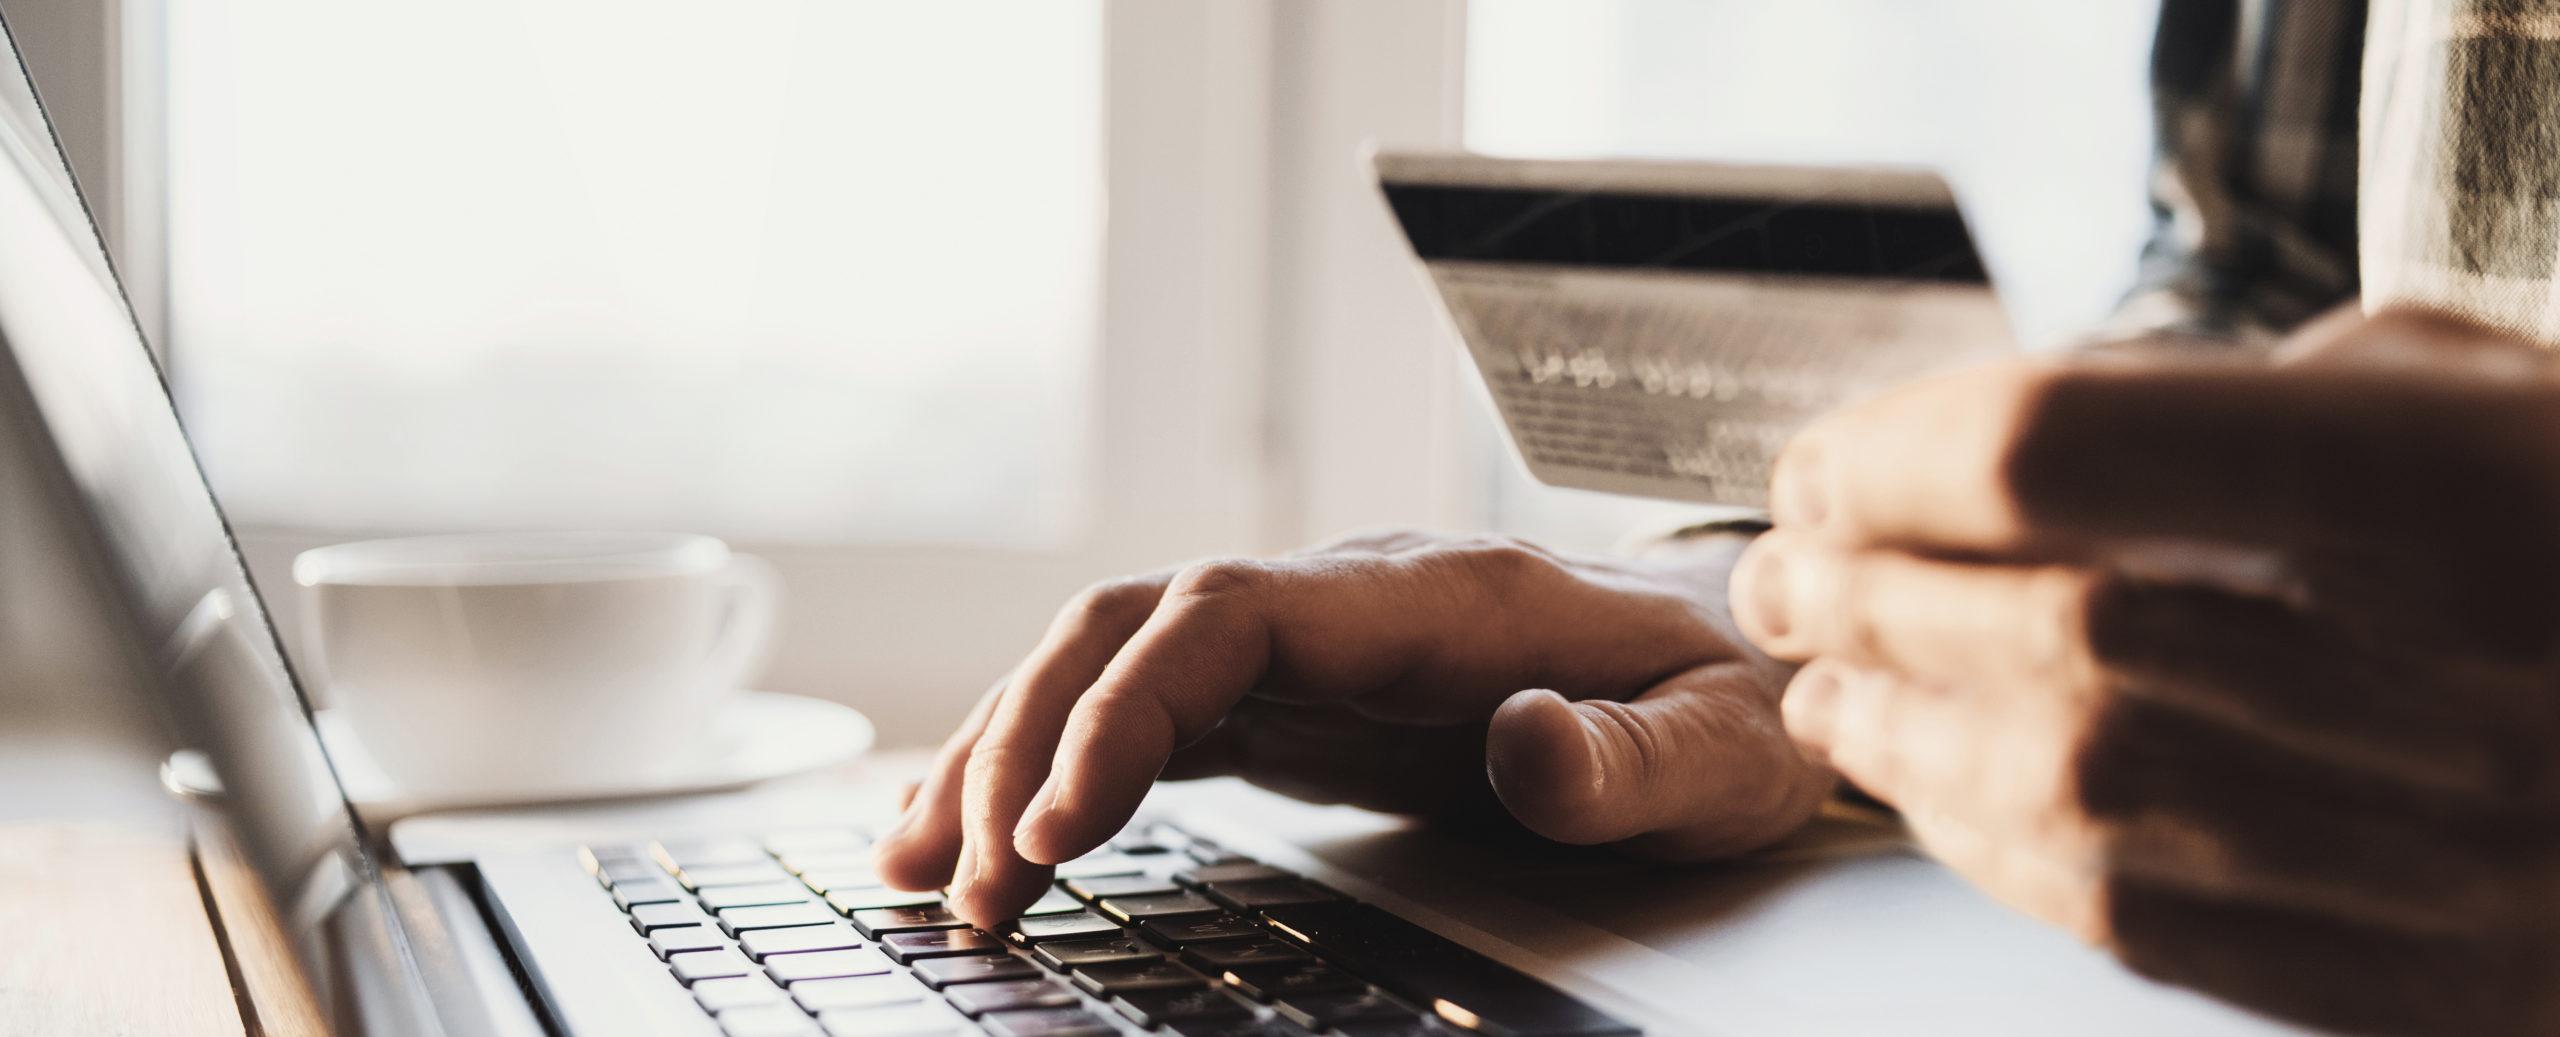 get business loan online singapore